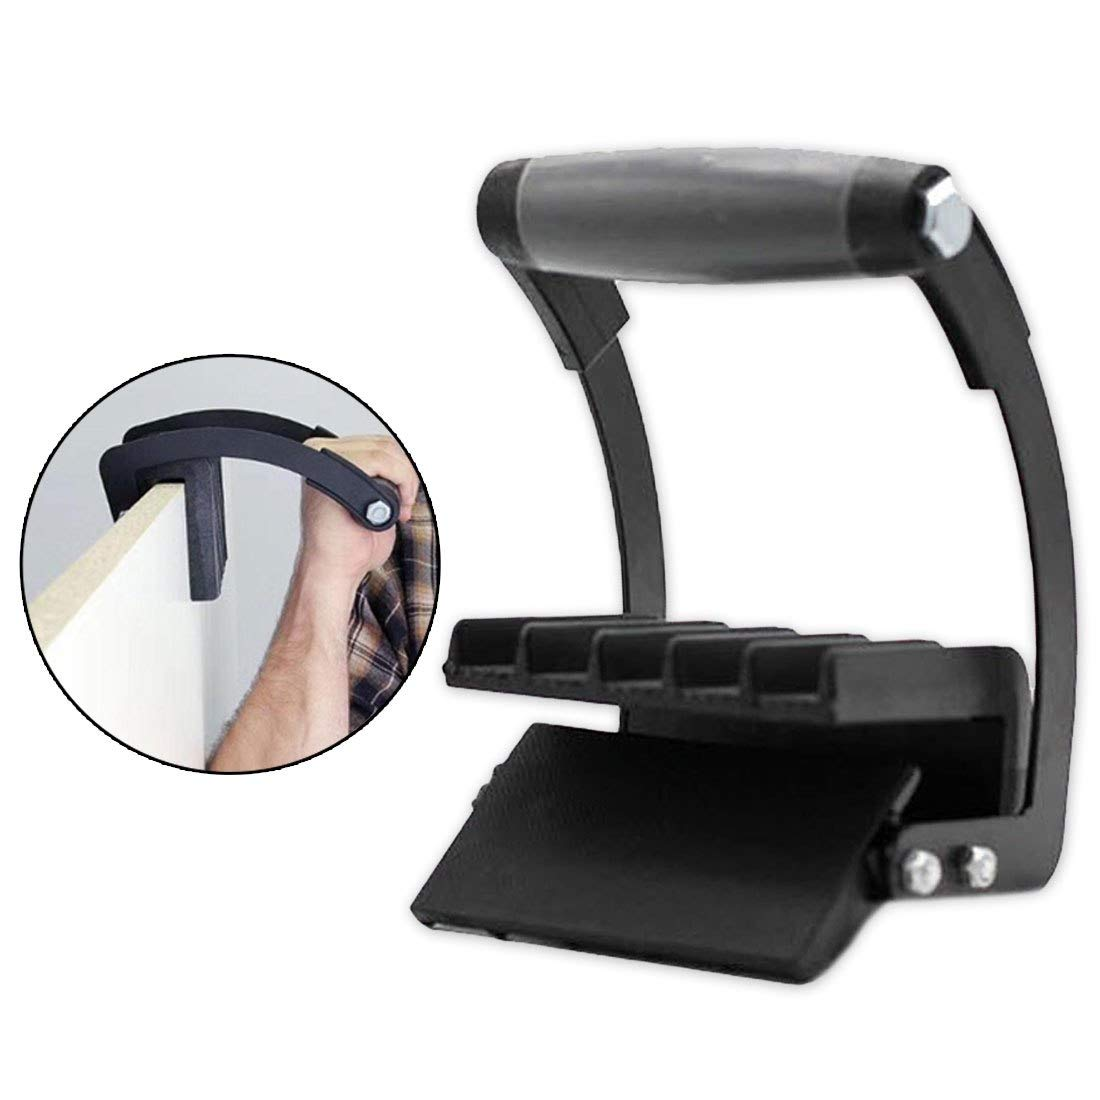 Easy Gorilla Gripper Advantage Handy Grip Board Lifter Plywood Panel Carrier